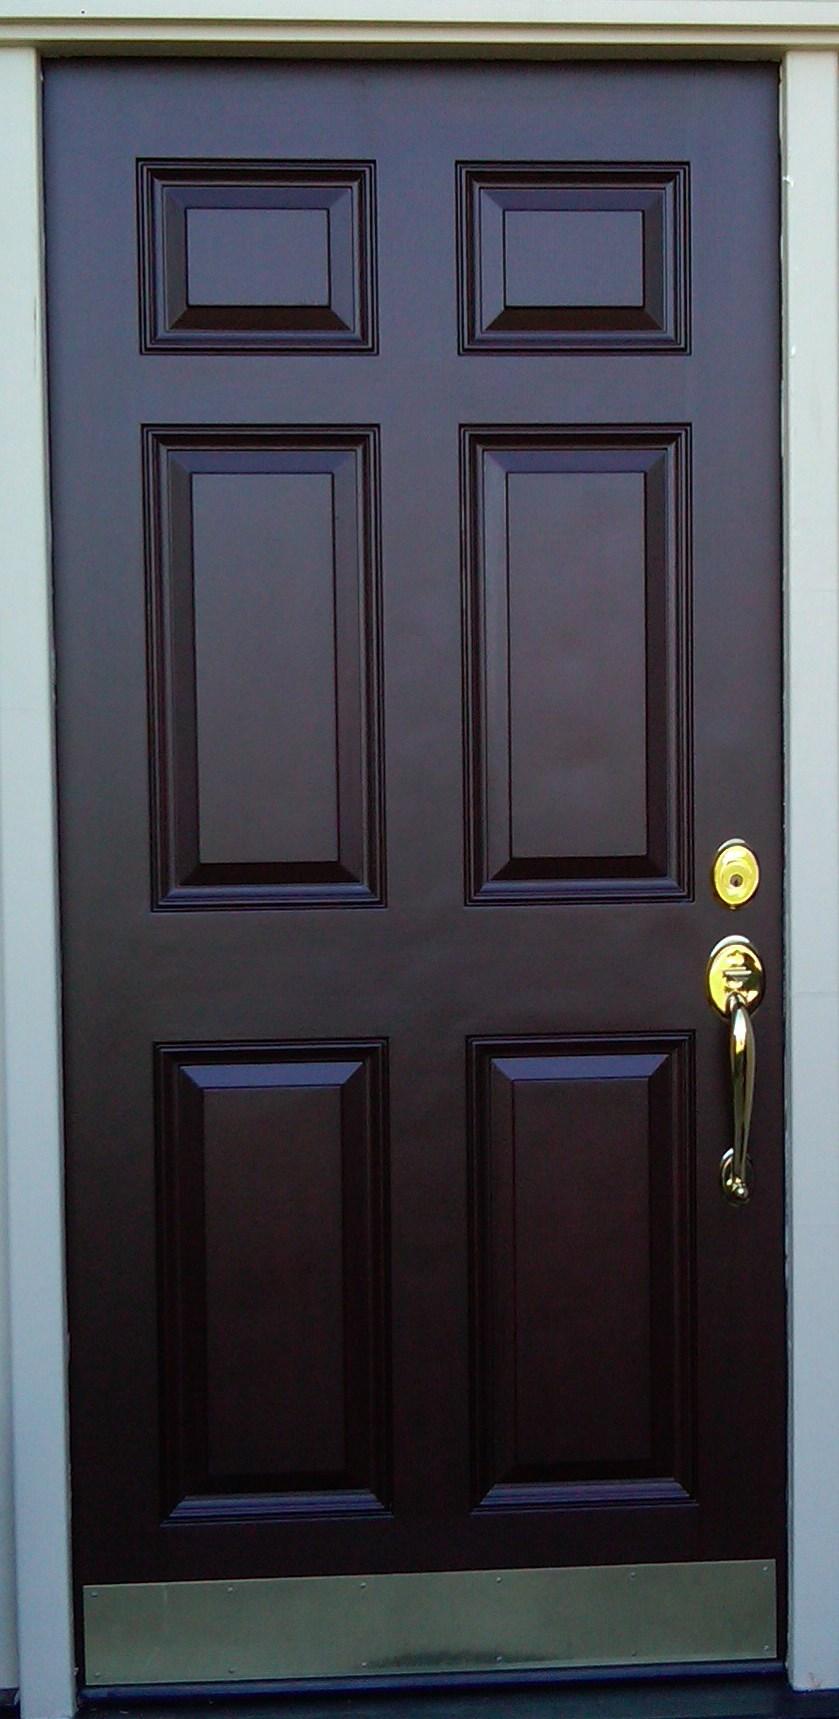 Door Renew Restore wood companies refinishing cost new oak refinish replace